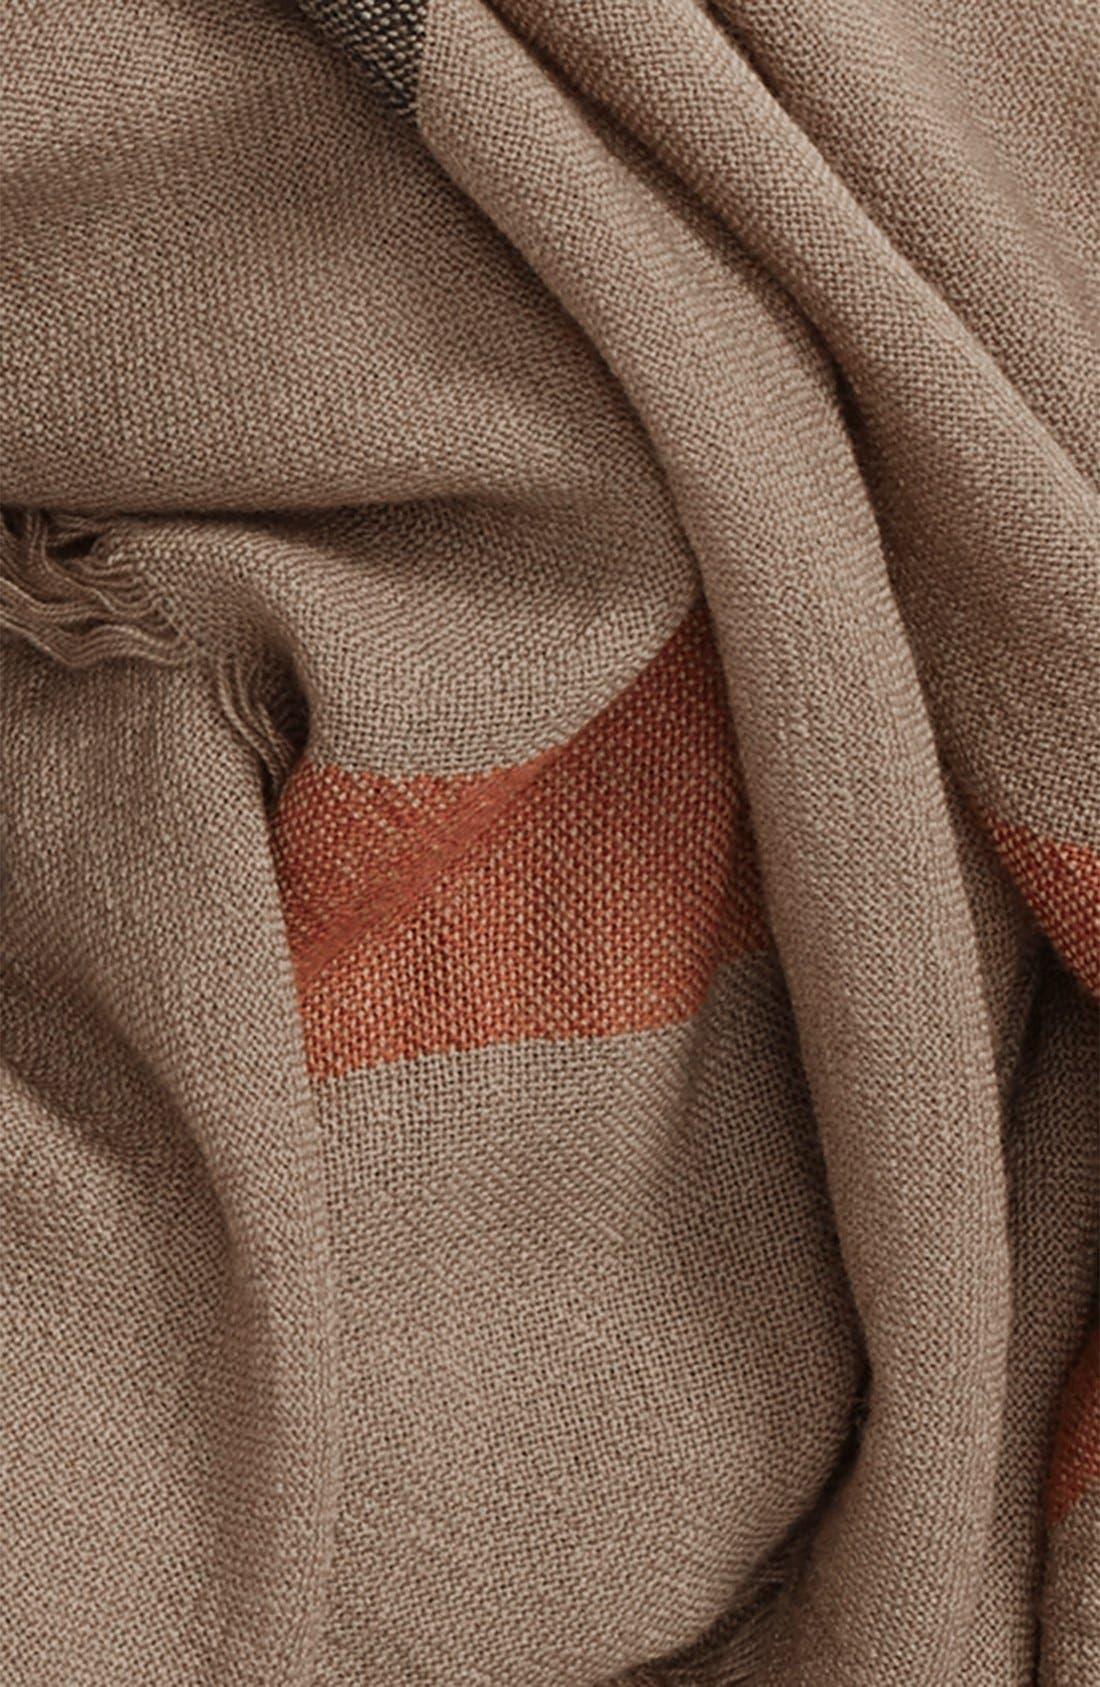 Check Merino Wool Scarf,                             Alternate thumbnail 3, color,                             House Check